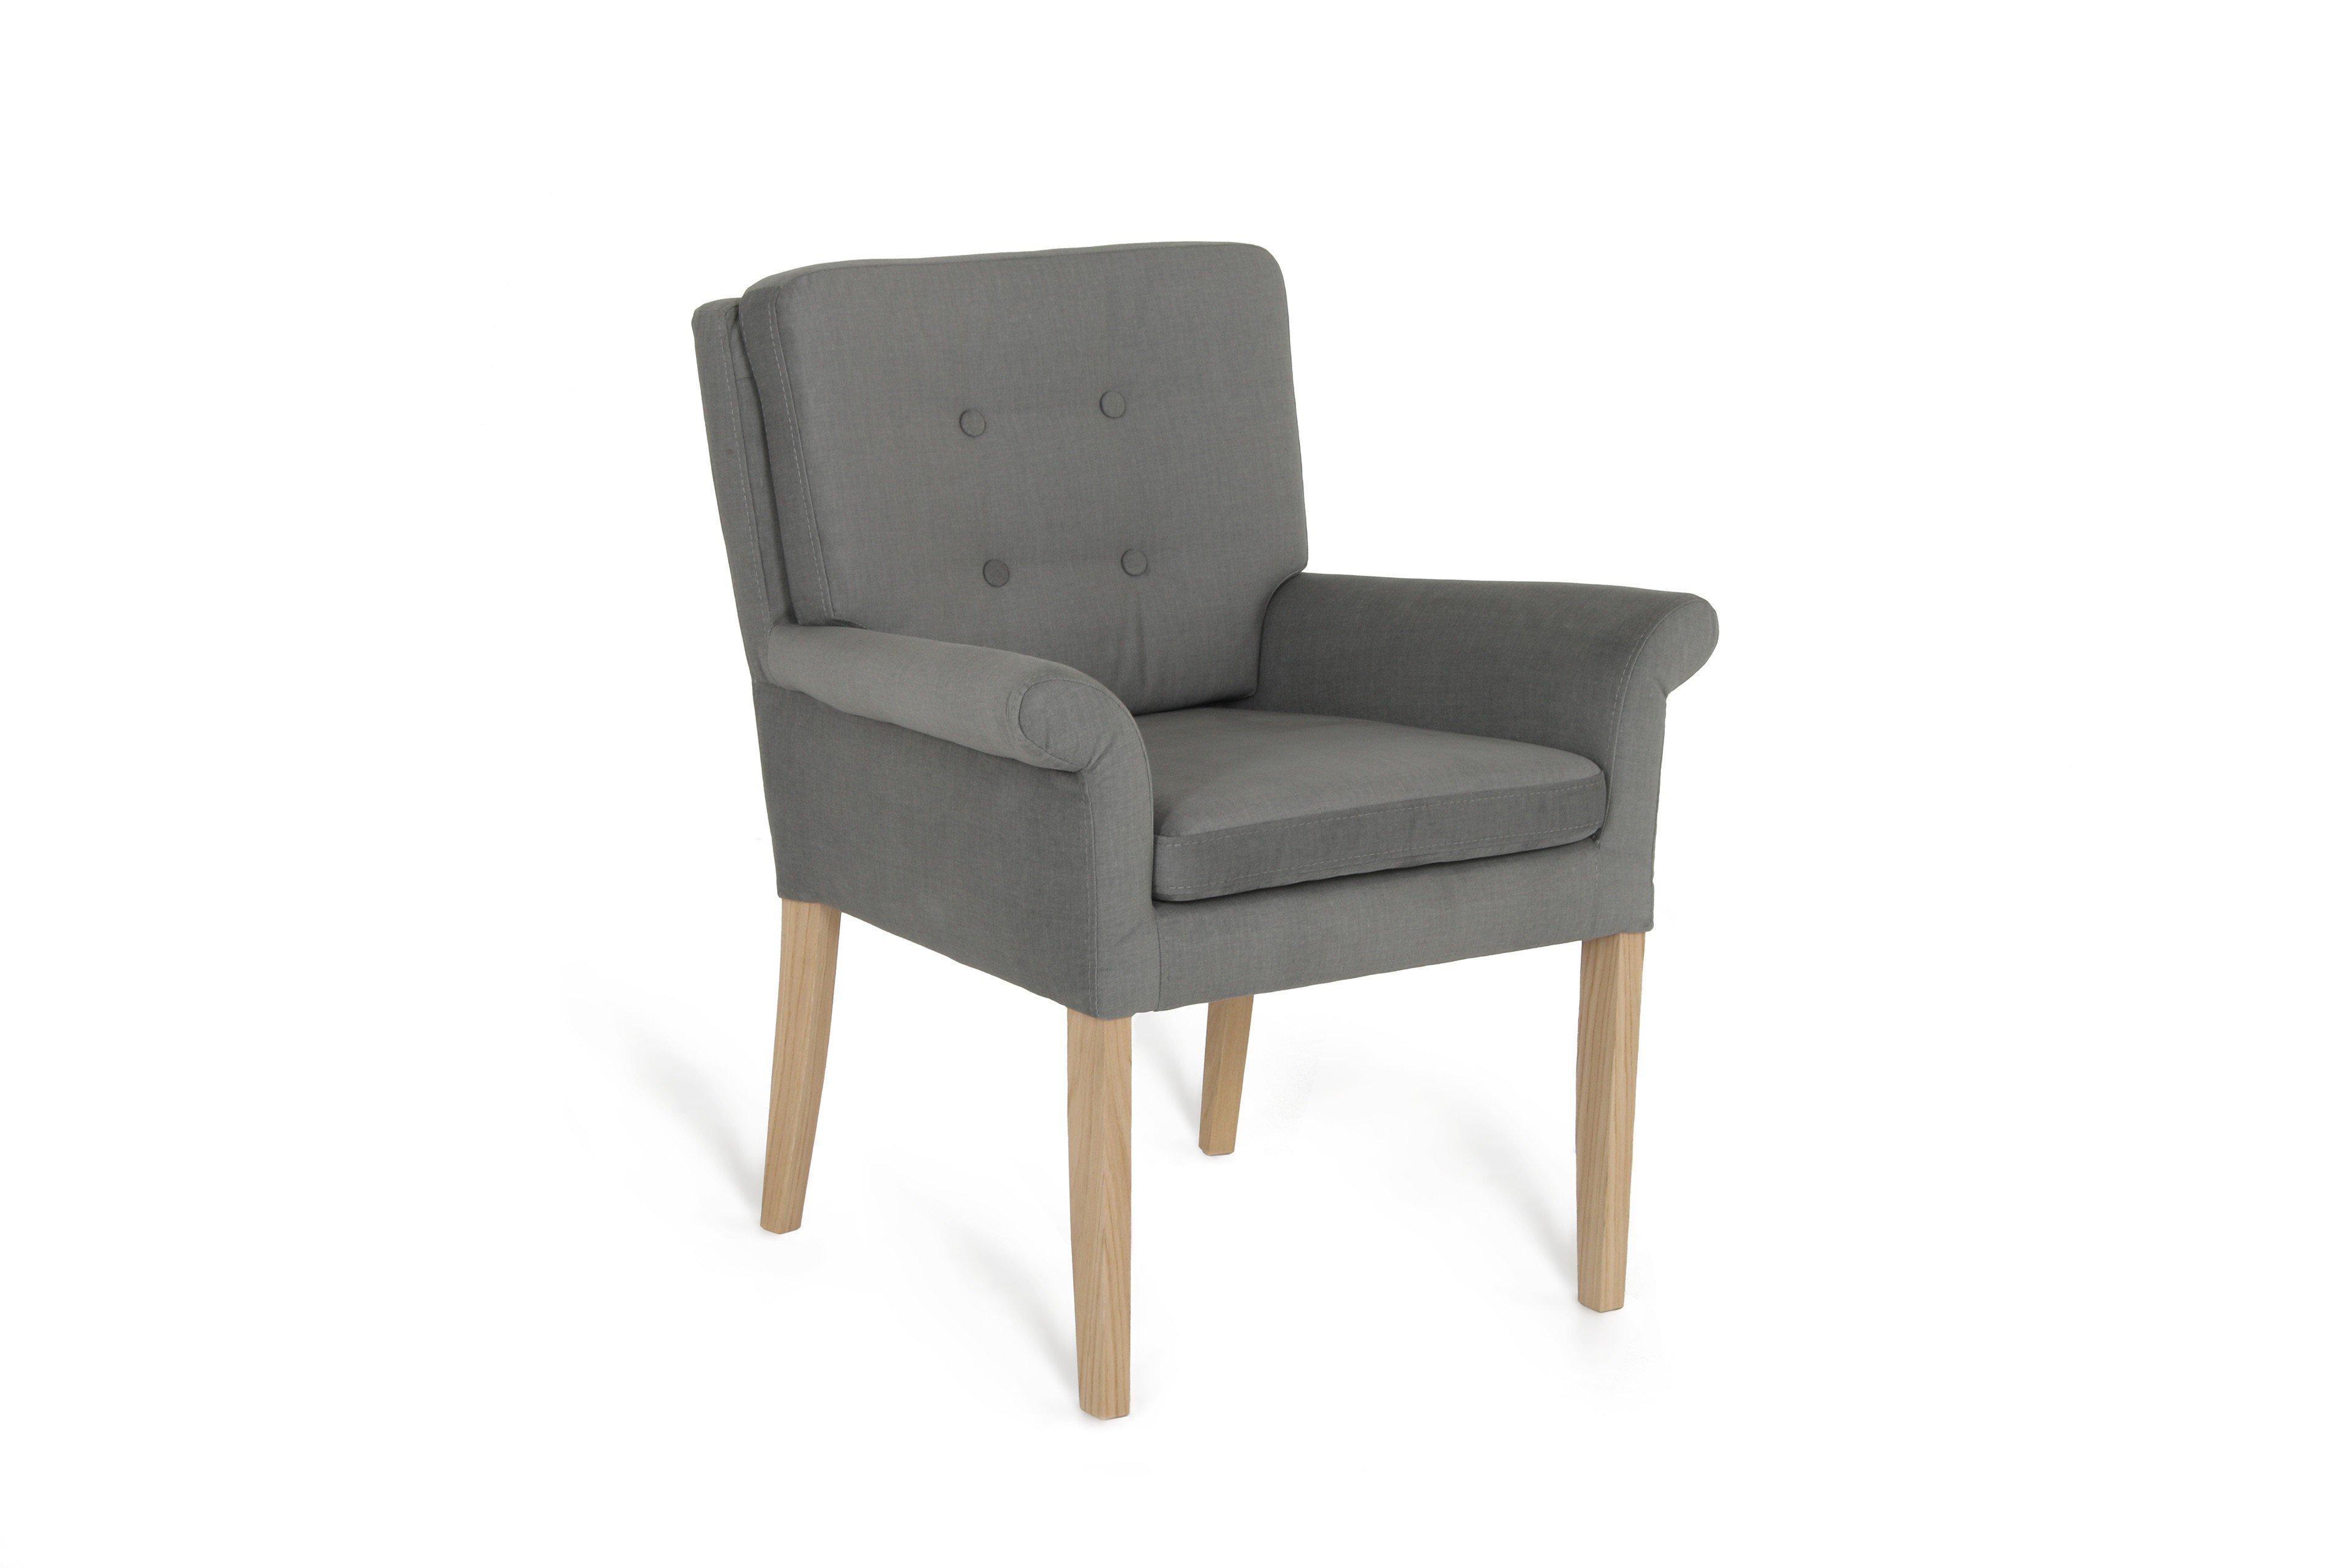 skandinavischer armlehnenstuhl motala in graphit m bel. Black Bedroom Furniture Sets. Home Design Ideas